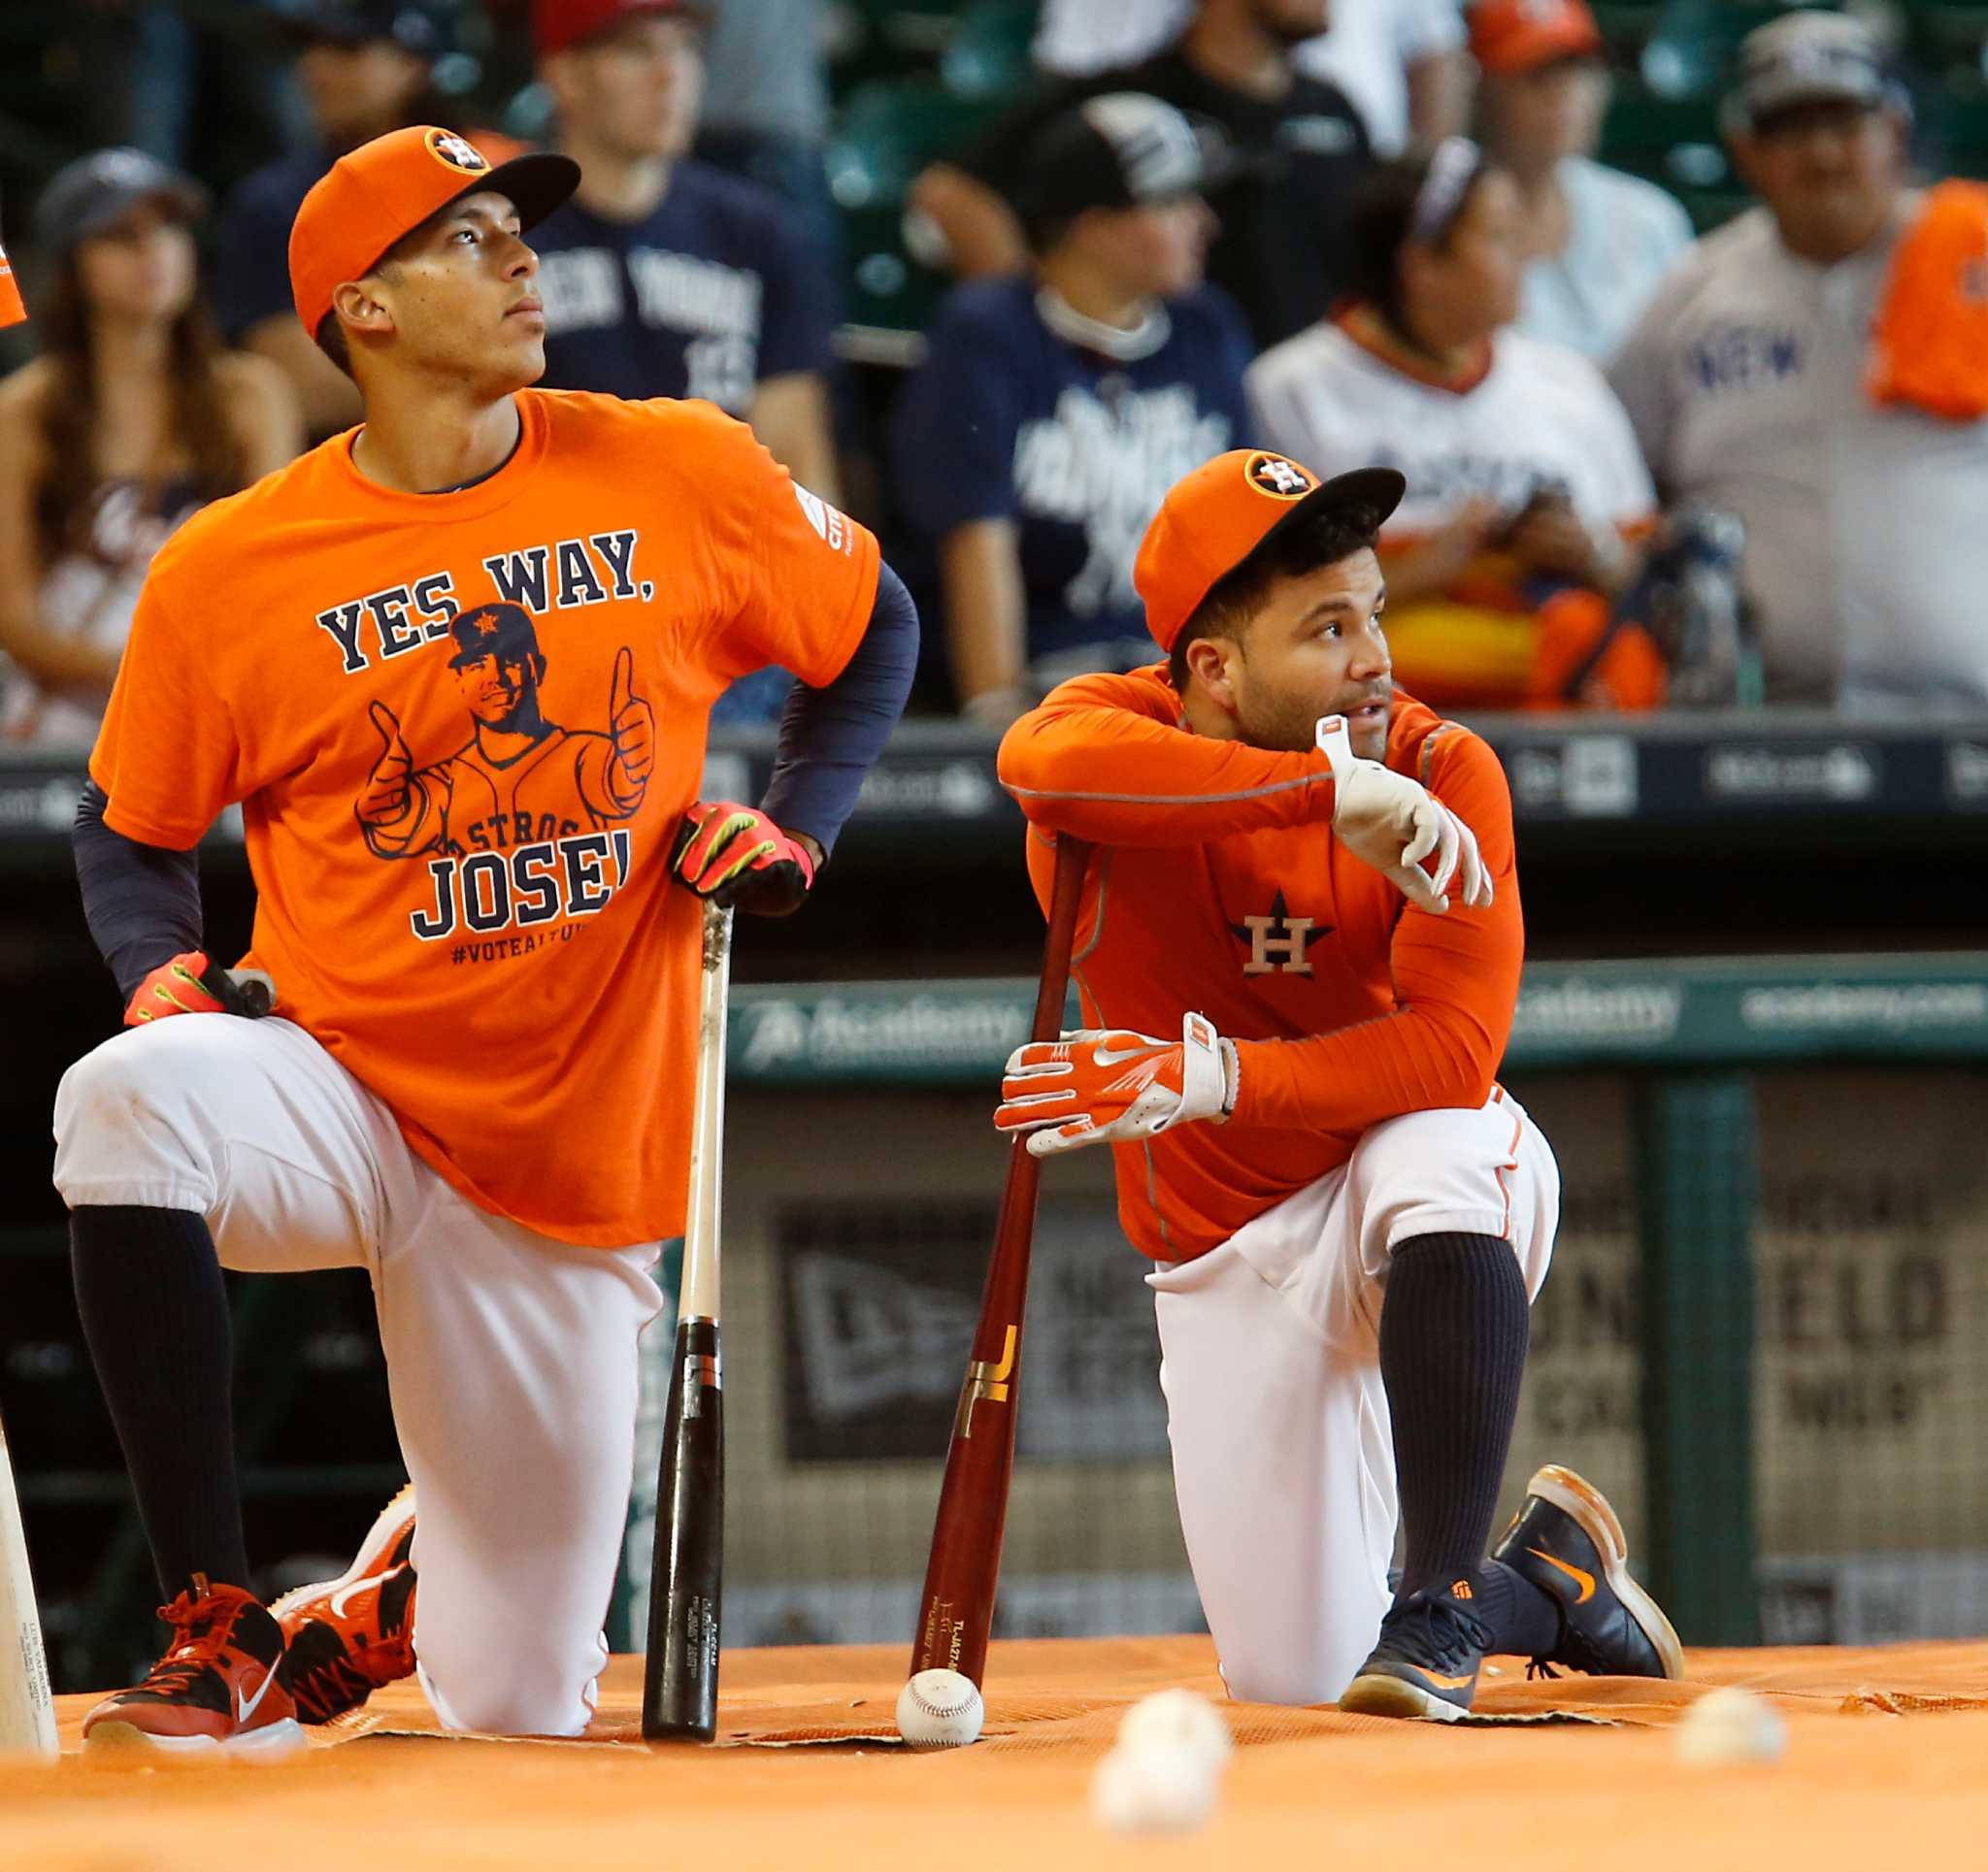 Carlos Correa And Jose Altuve We Re Like Brothers Correa